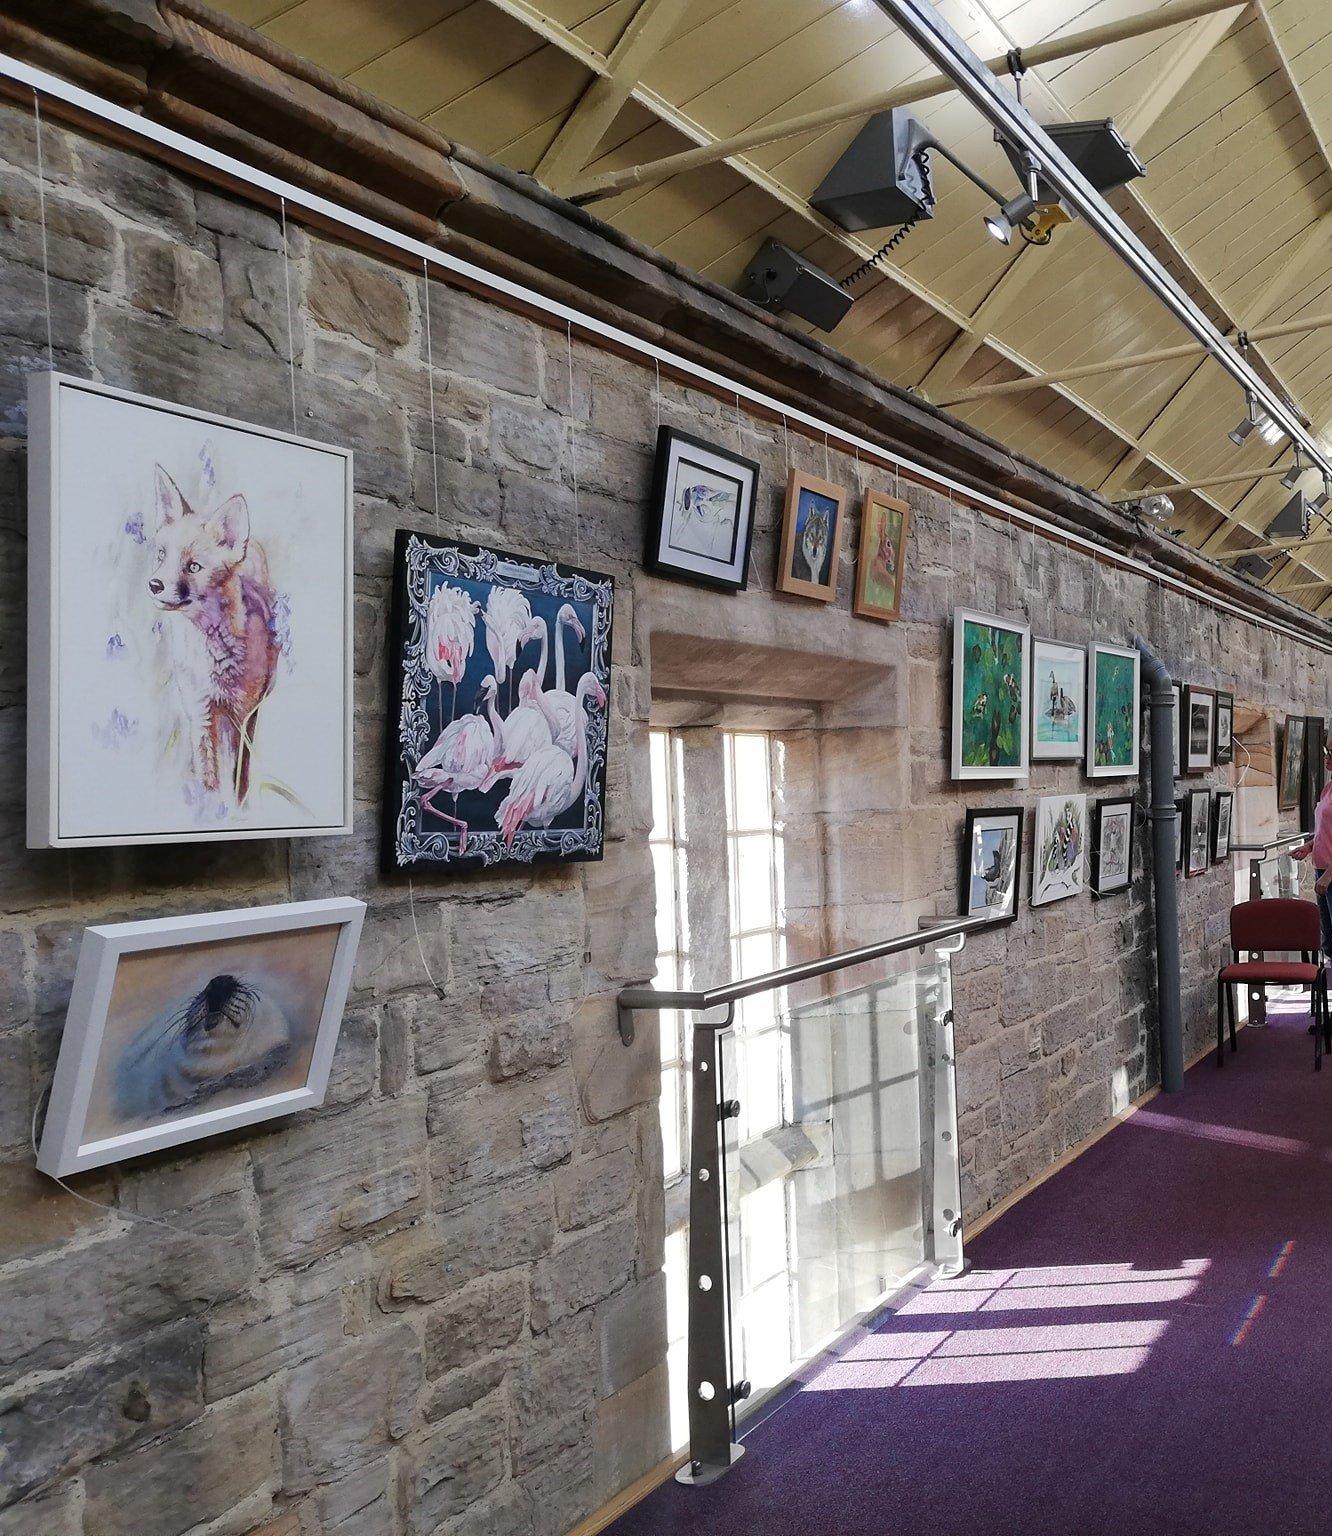 association of animal artists exhibition